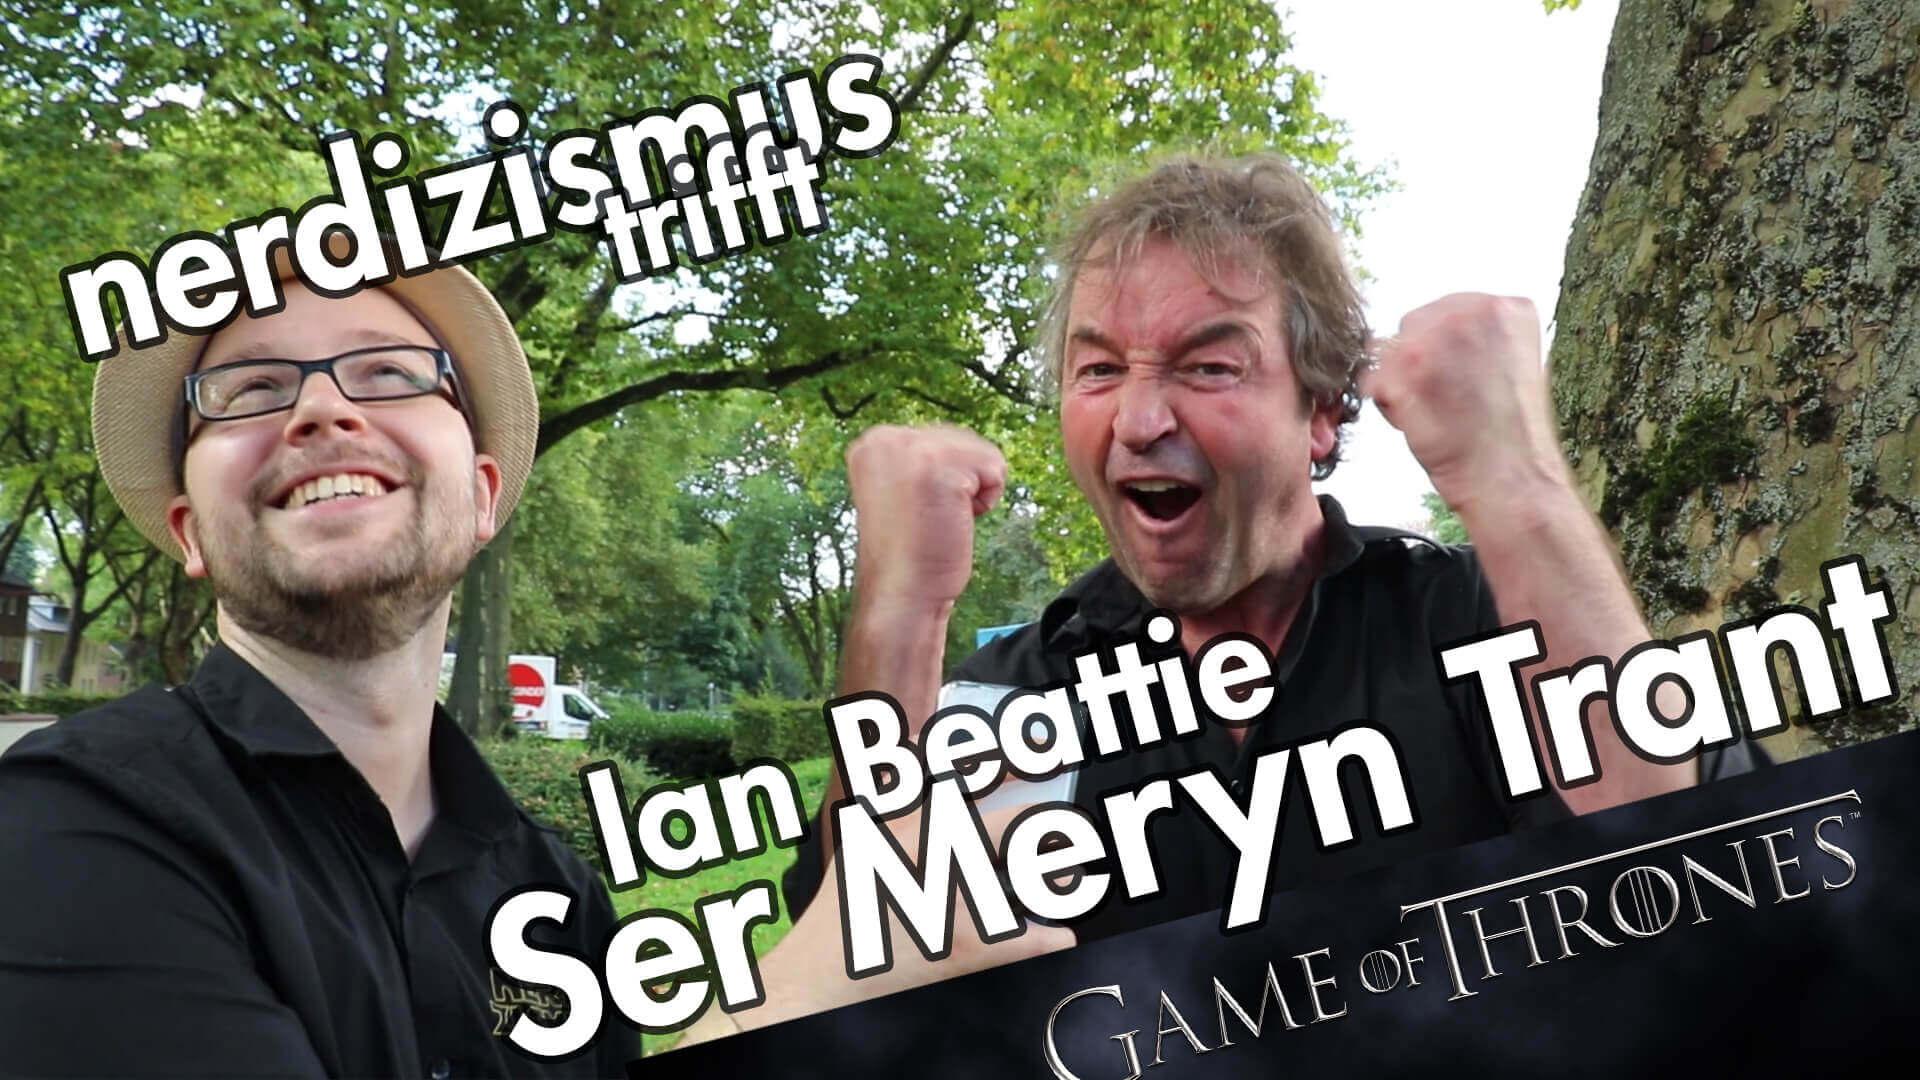 Nerdizismus meets Ian Beattie (Meryn Trant, Game of Thrones) @ Phantastika